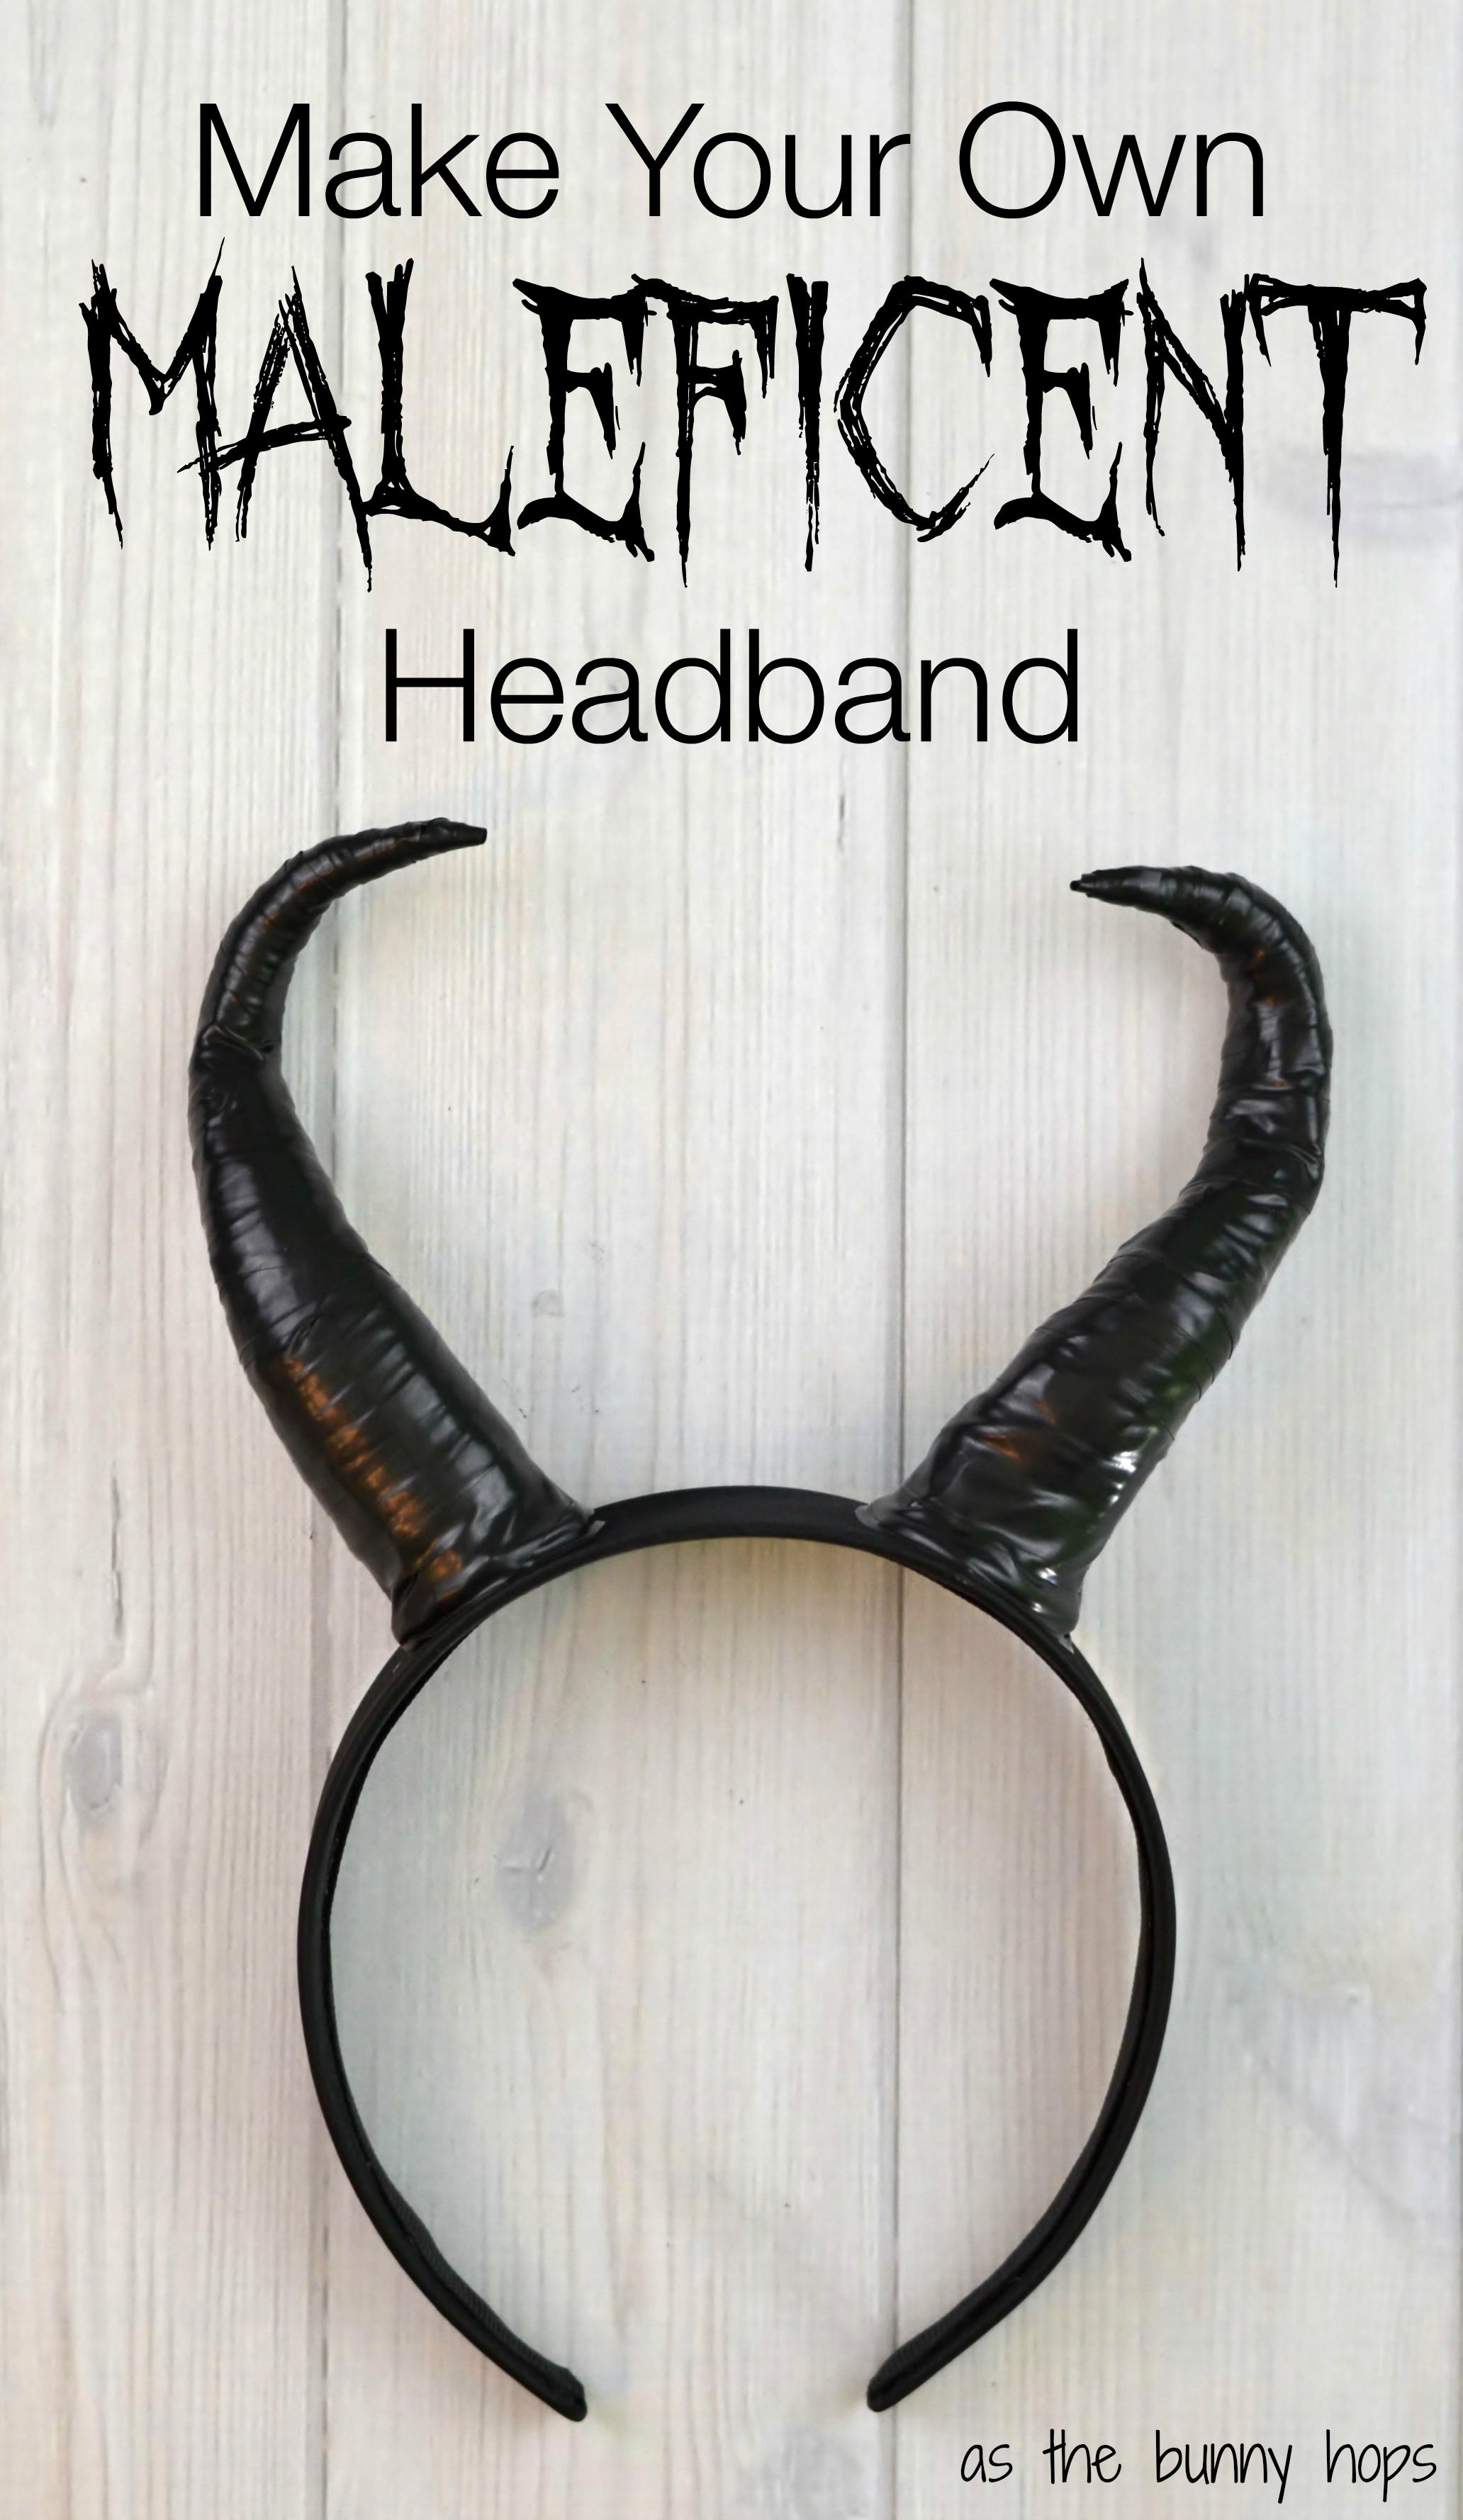 Diy maleficent headband as the bunny hops diy maleficent headband solutioingenieria Images